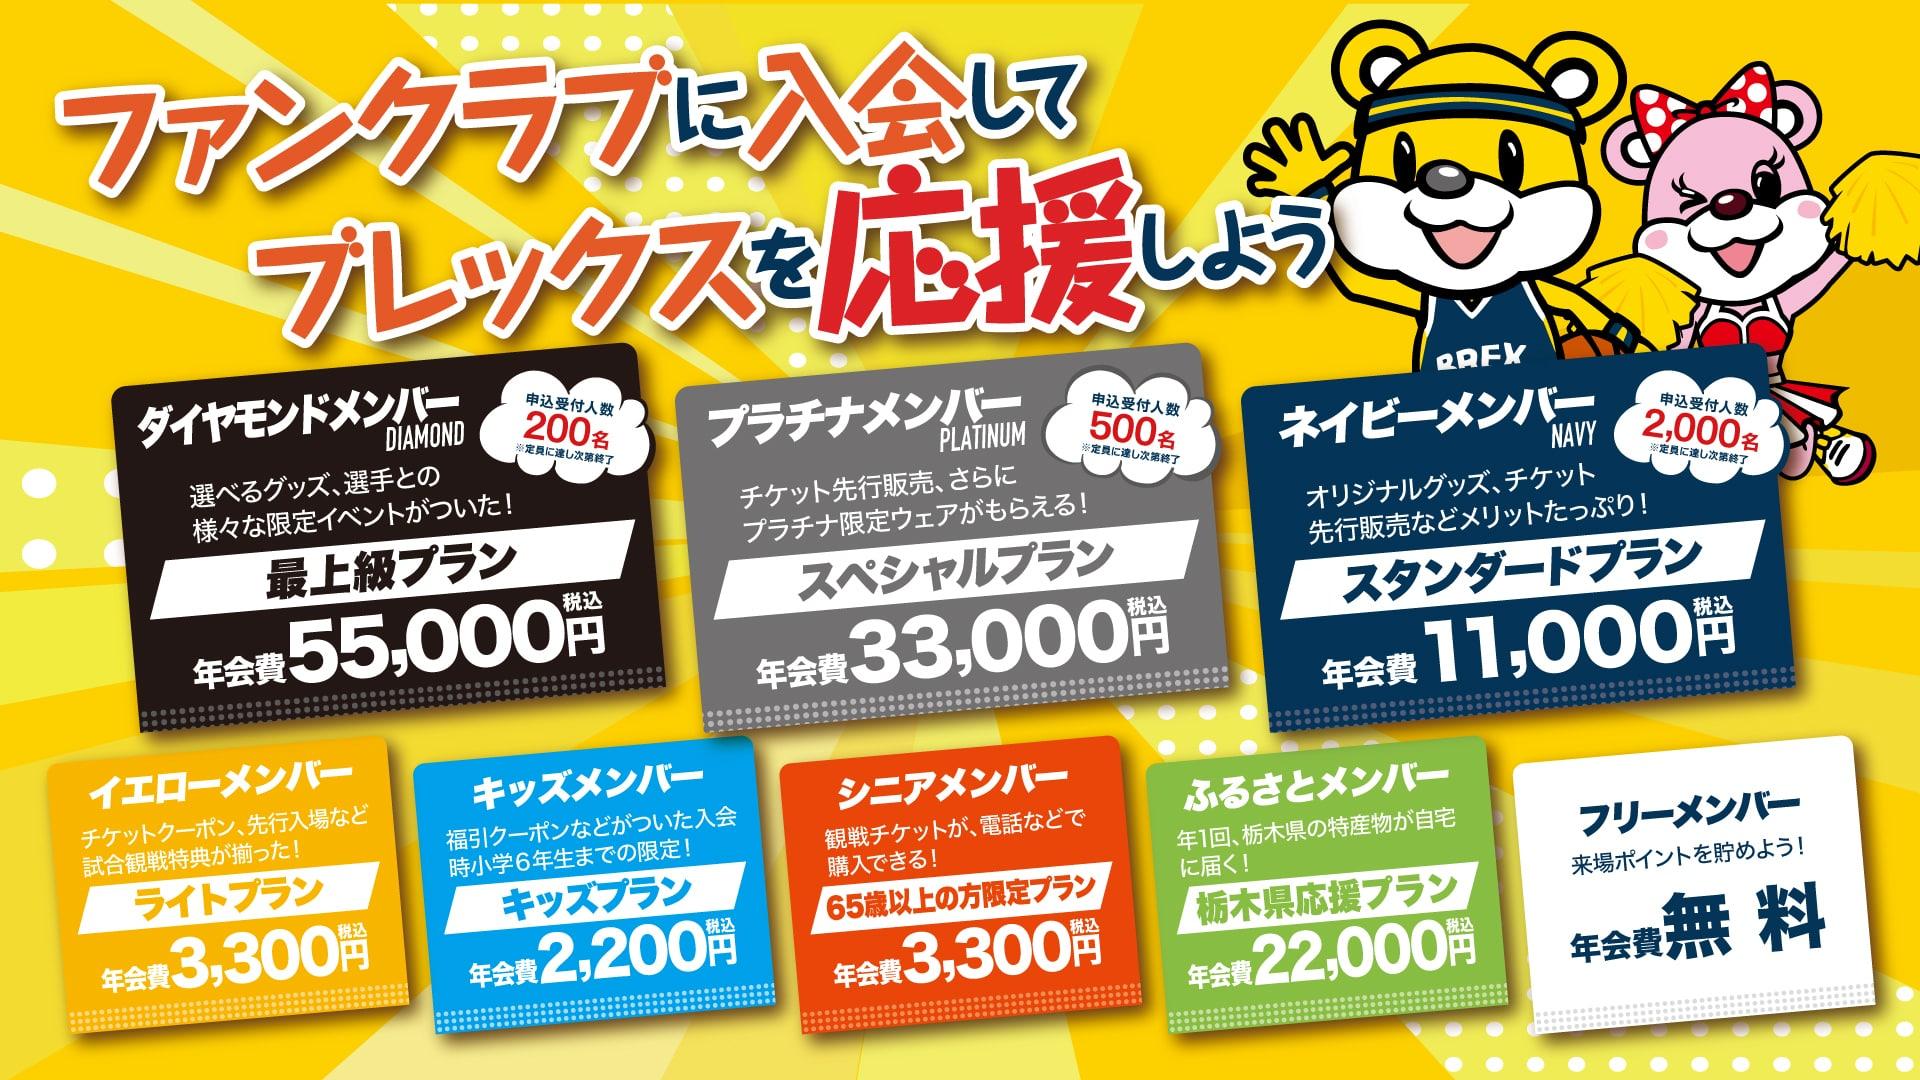 2020-21シーズン CLUB-REX入会